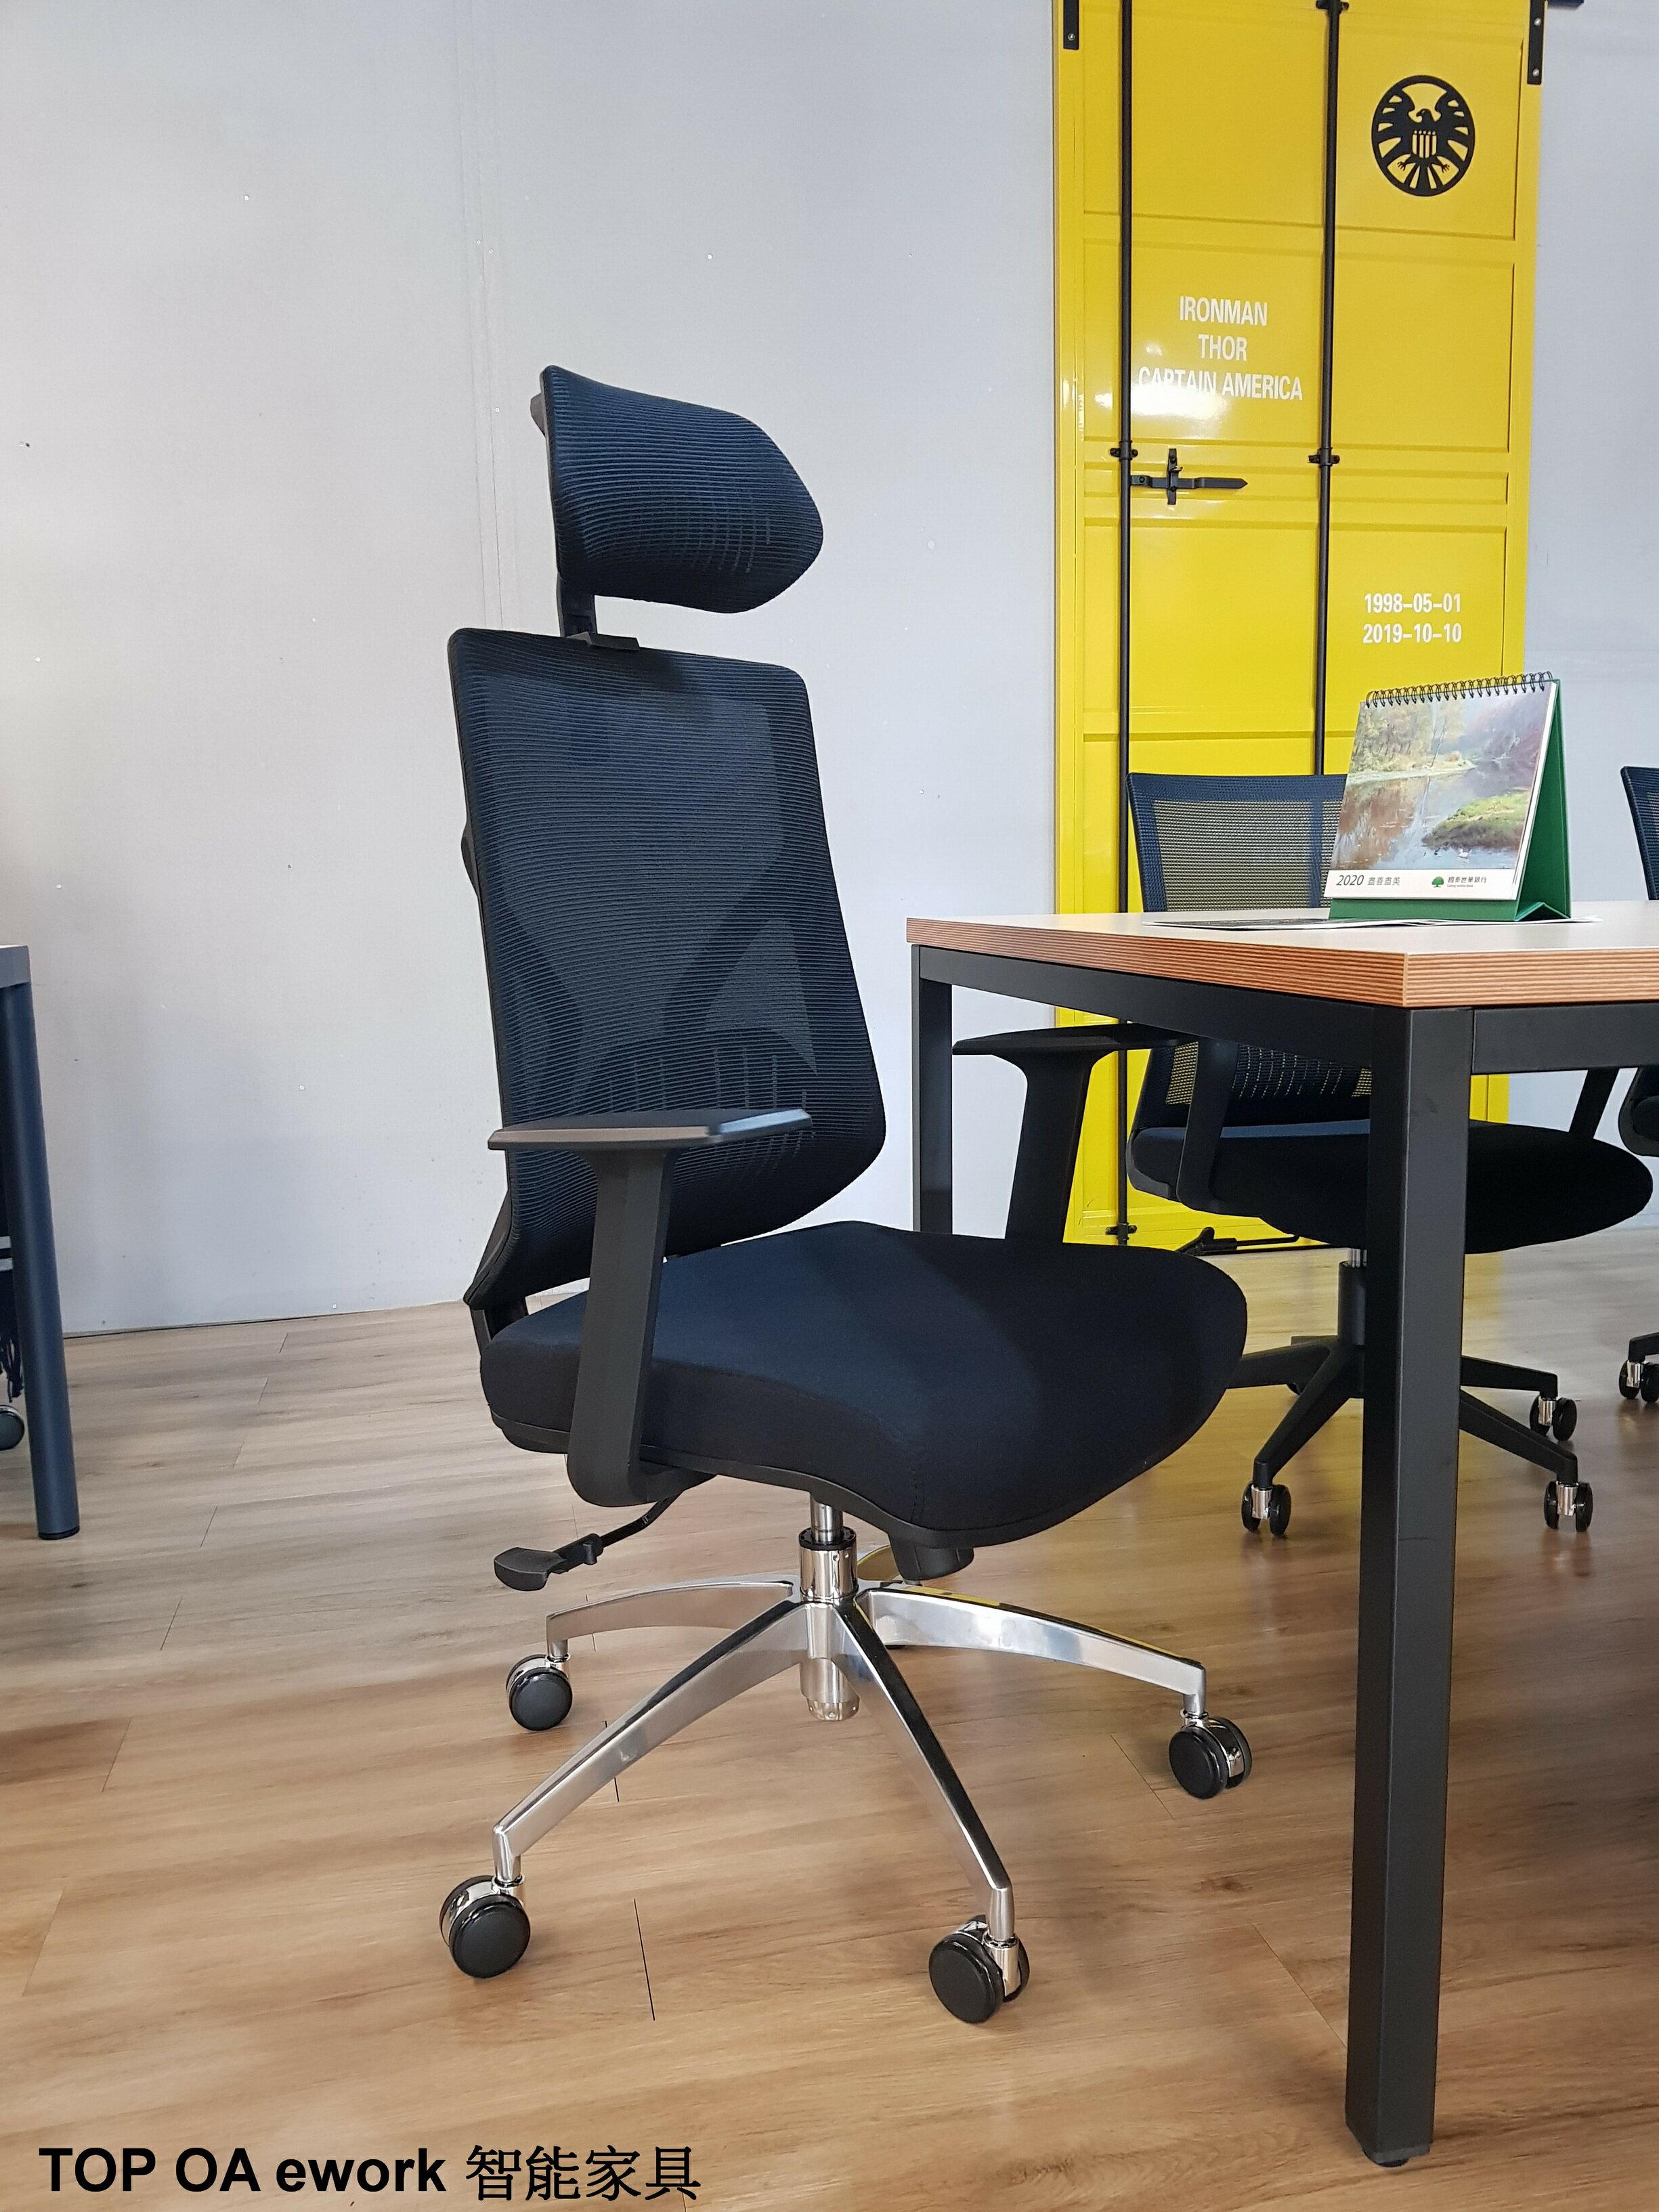 [TOP OA] C-11/ 6D人體工學椅/躺椅/大型主管椅/大型辦公椅/人體工學椅/高背辦公網椅/電競椅/電腦椅